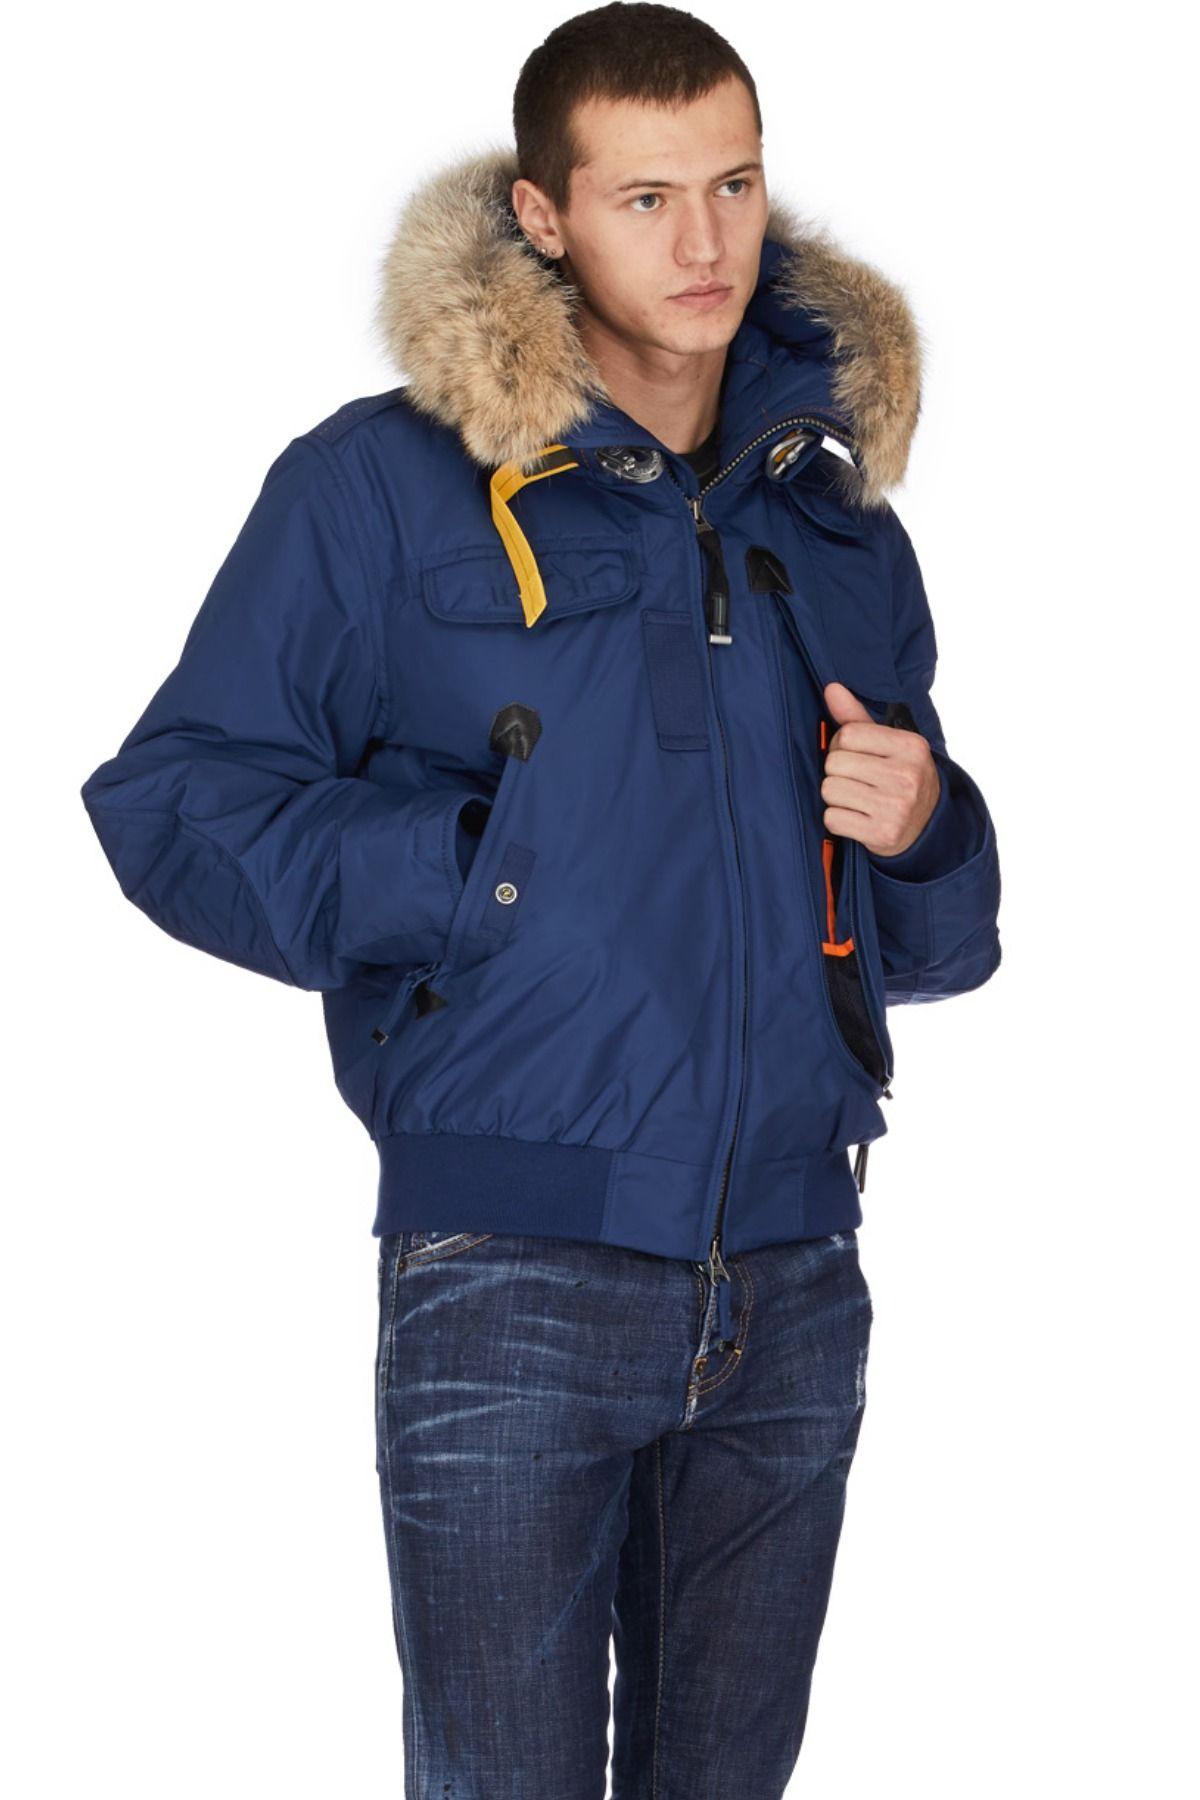 Parajumpers Gobi Bomber Navy In 2021 Mens Winter Fashion Men S Coats Jackets Mens Jackets [ 1800 x 1200 Pixel ]